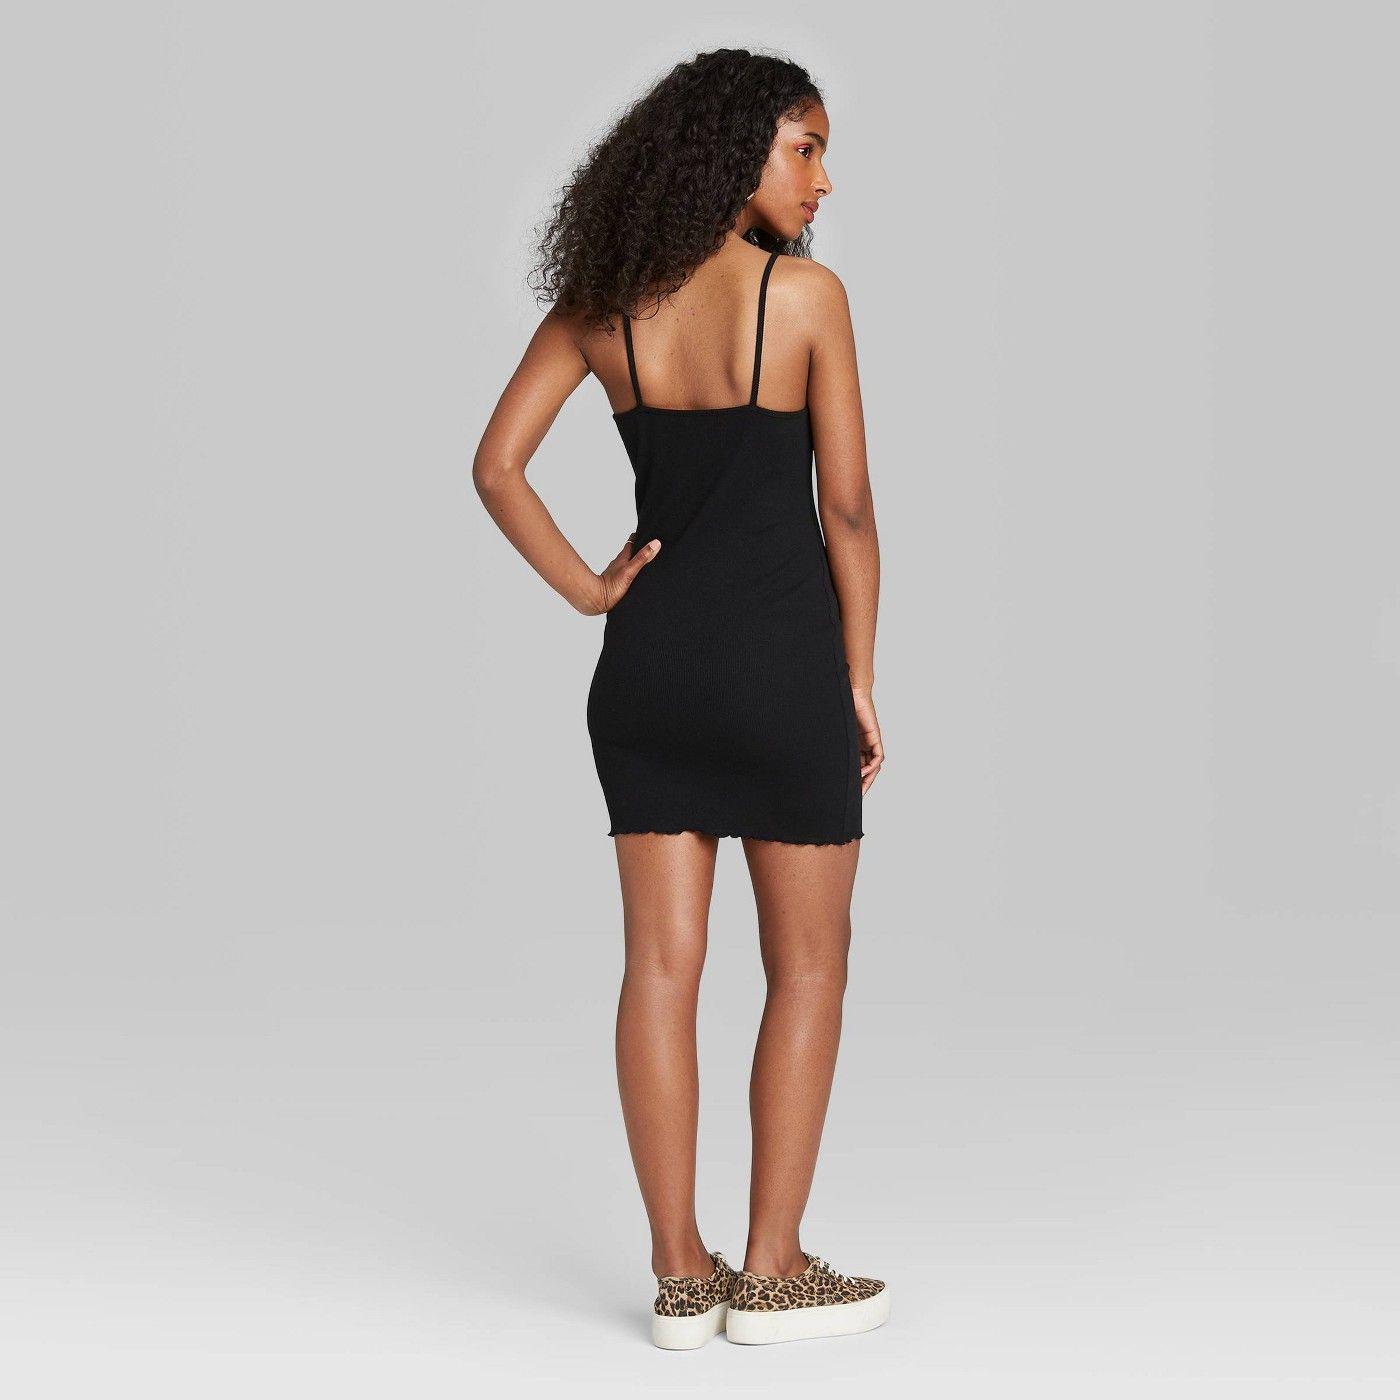 Women S Sleeveless Bodycon Knit Dress Wild Fable Regular Plus Sponsored Bodycon Sponsored Knit Women Knit Dress Knitted Bodycon Dress Women [ 1400 x 1400 Pixel ]